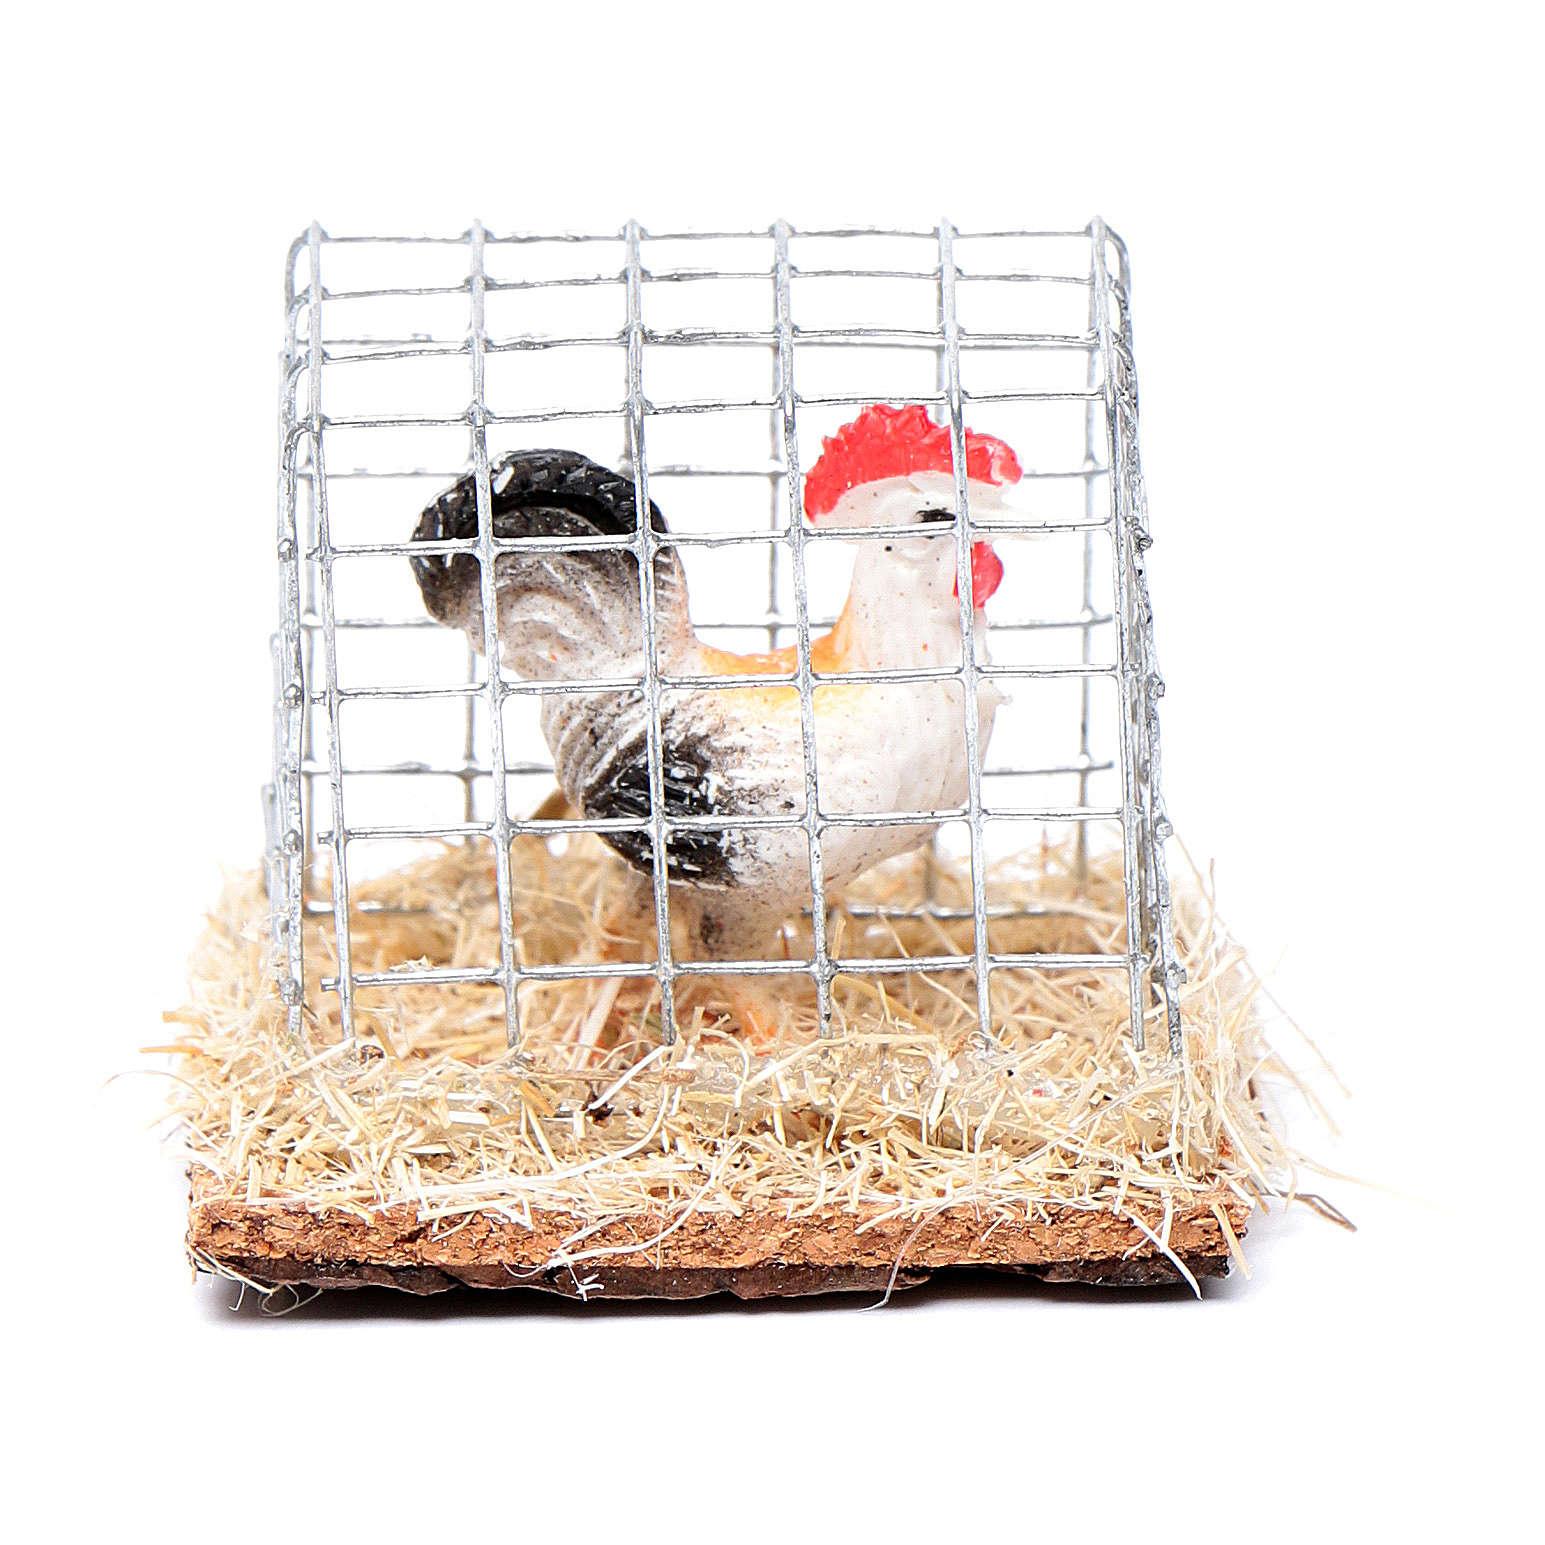 Cage with cock, Nativity Scene figurine 3 cm assorted 3